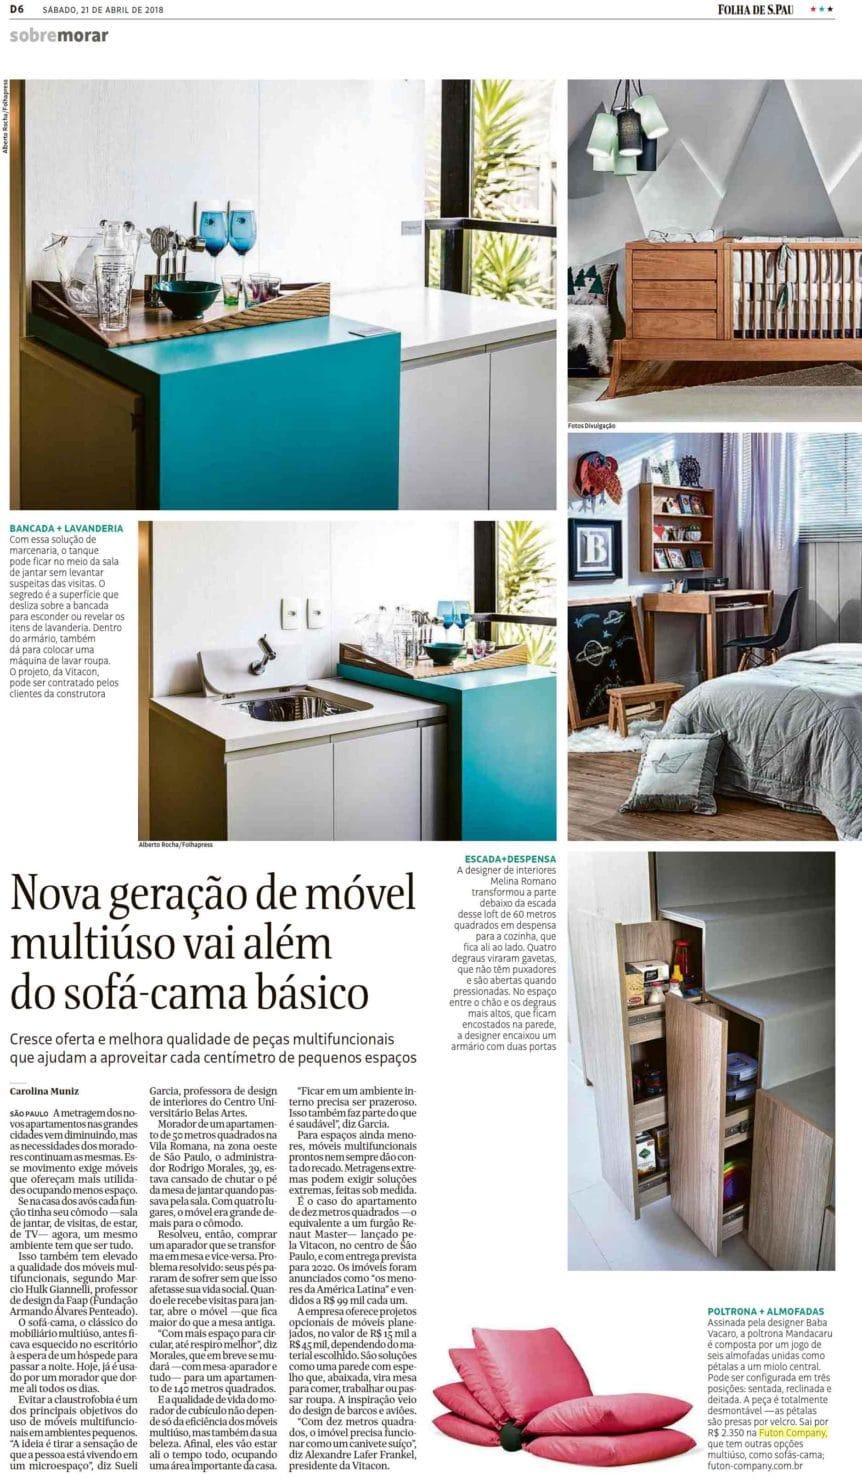 Mandacaru-poltrona-multifuncional-folha de sao paulo-abril2018_files